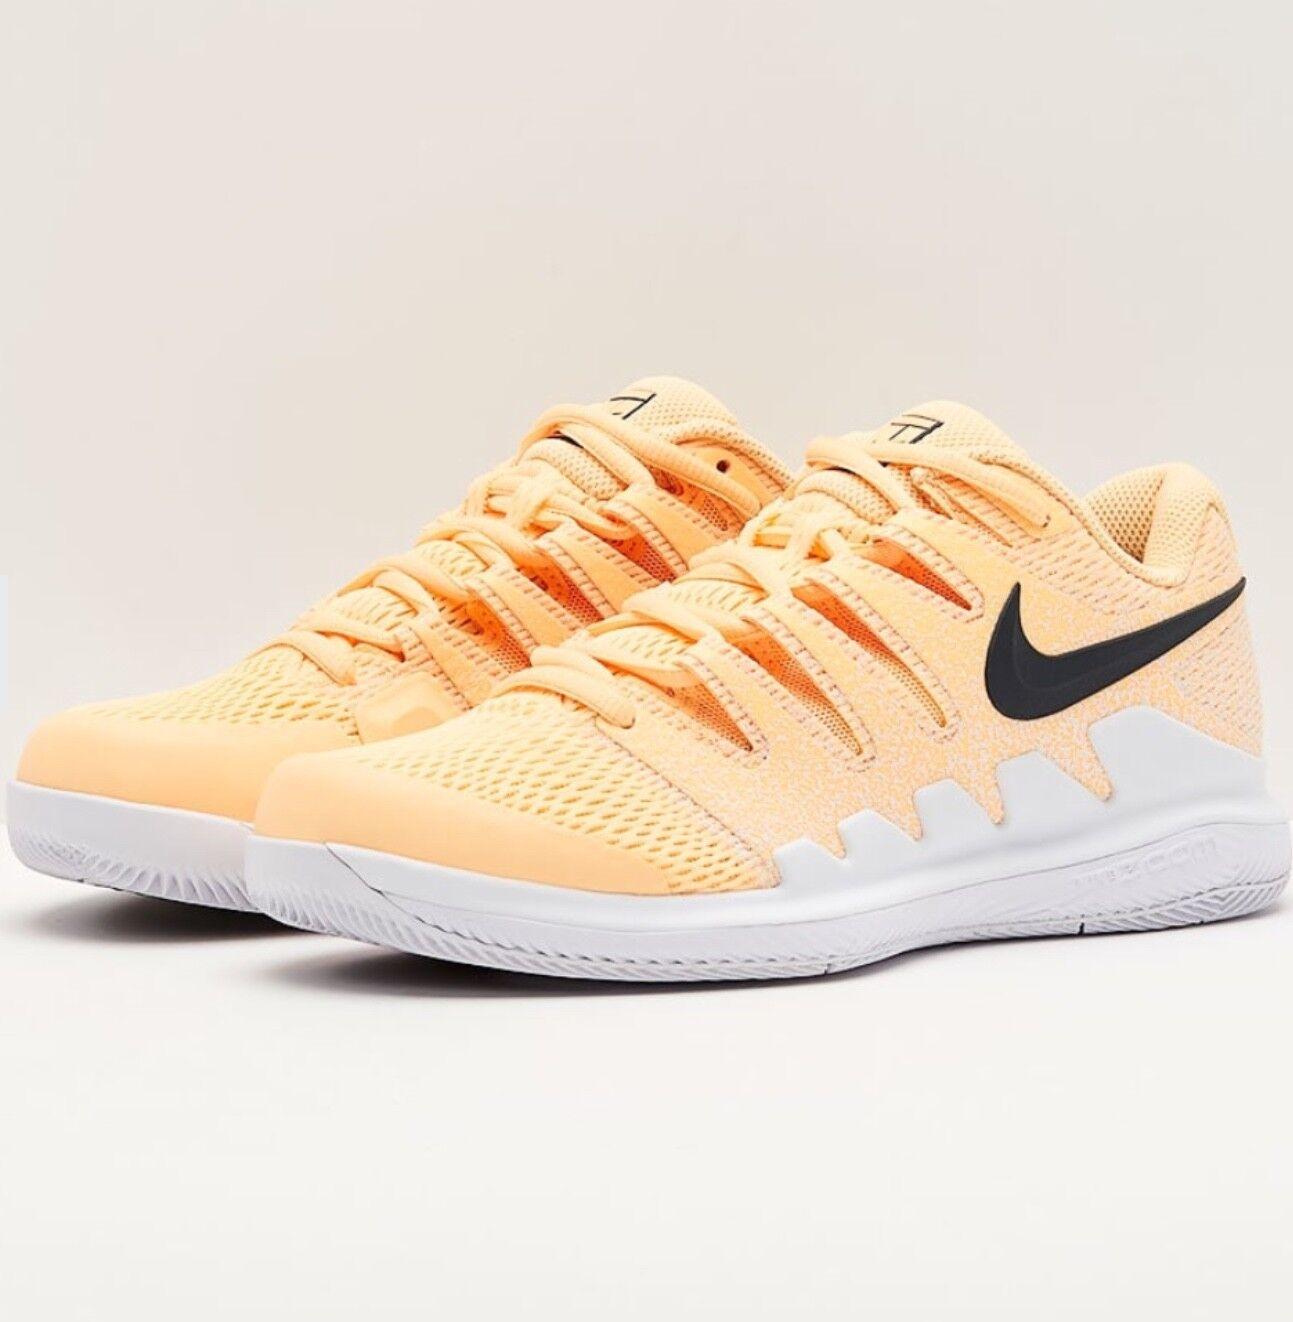 Nike Air Zoom Vapor X HC Tenis Zapato Mandarina Mandarina Mandarina tinte AA8027-801 UK9.5 US12  Sin impuestos